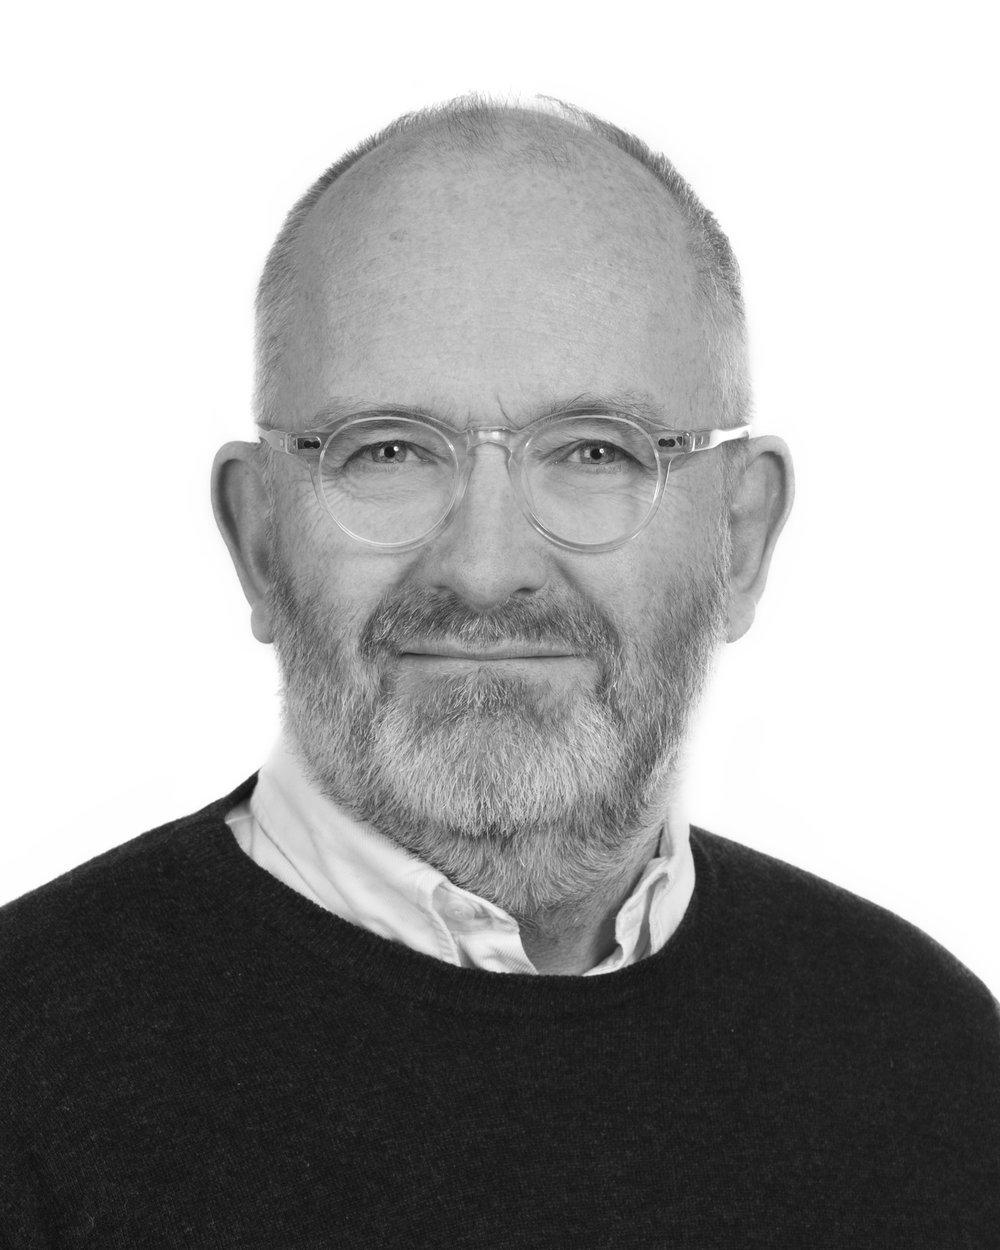 8. Baldur Ó. Svavarsson